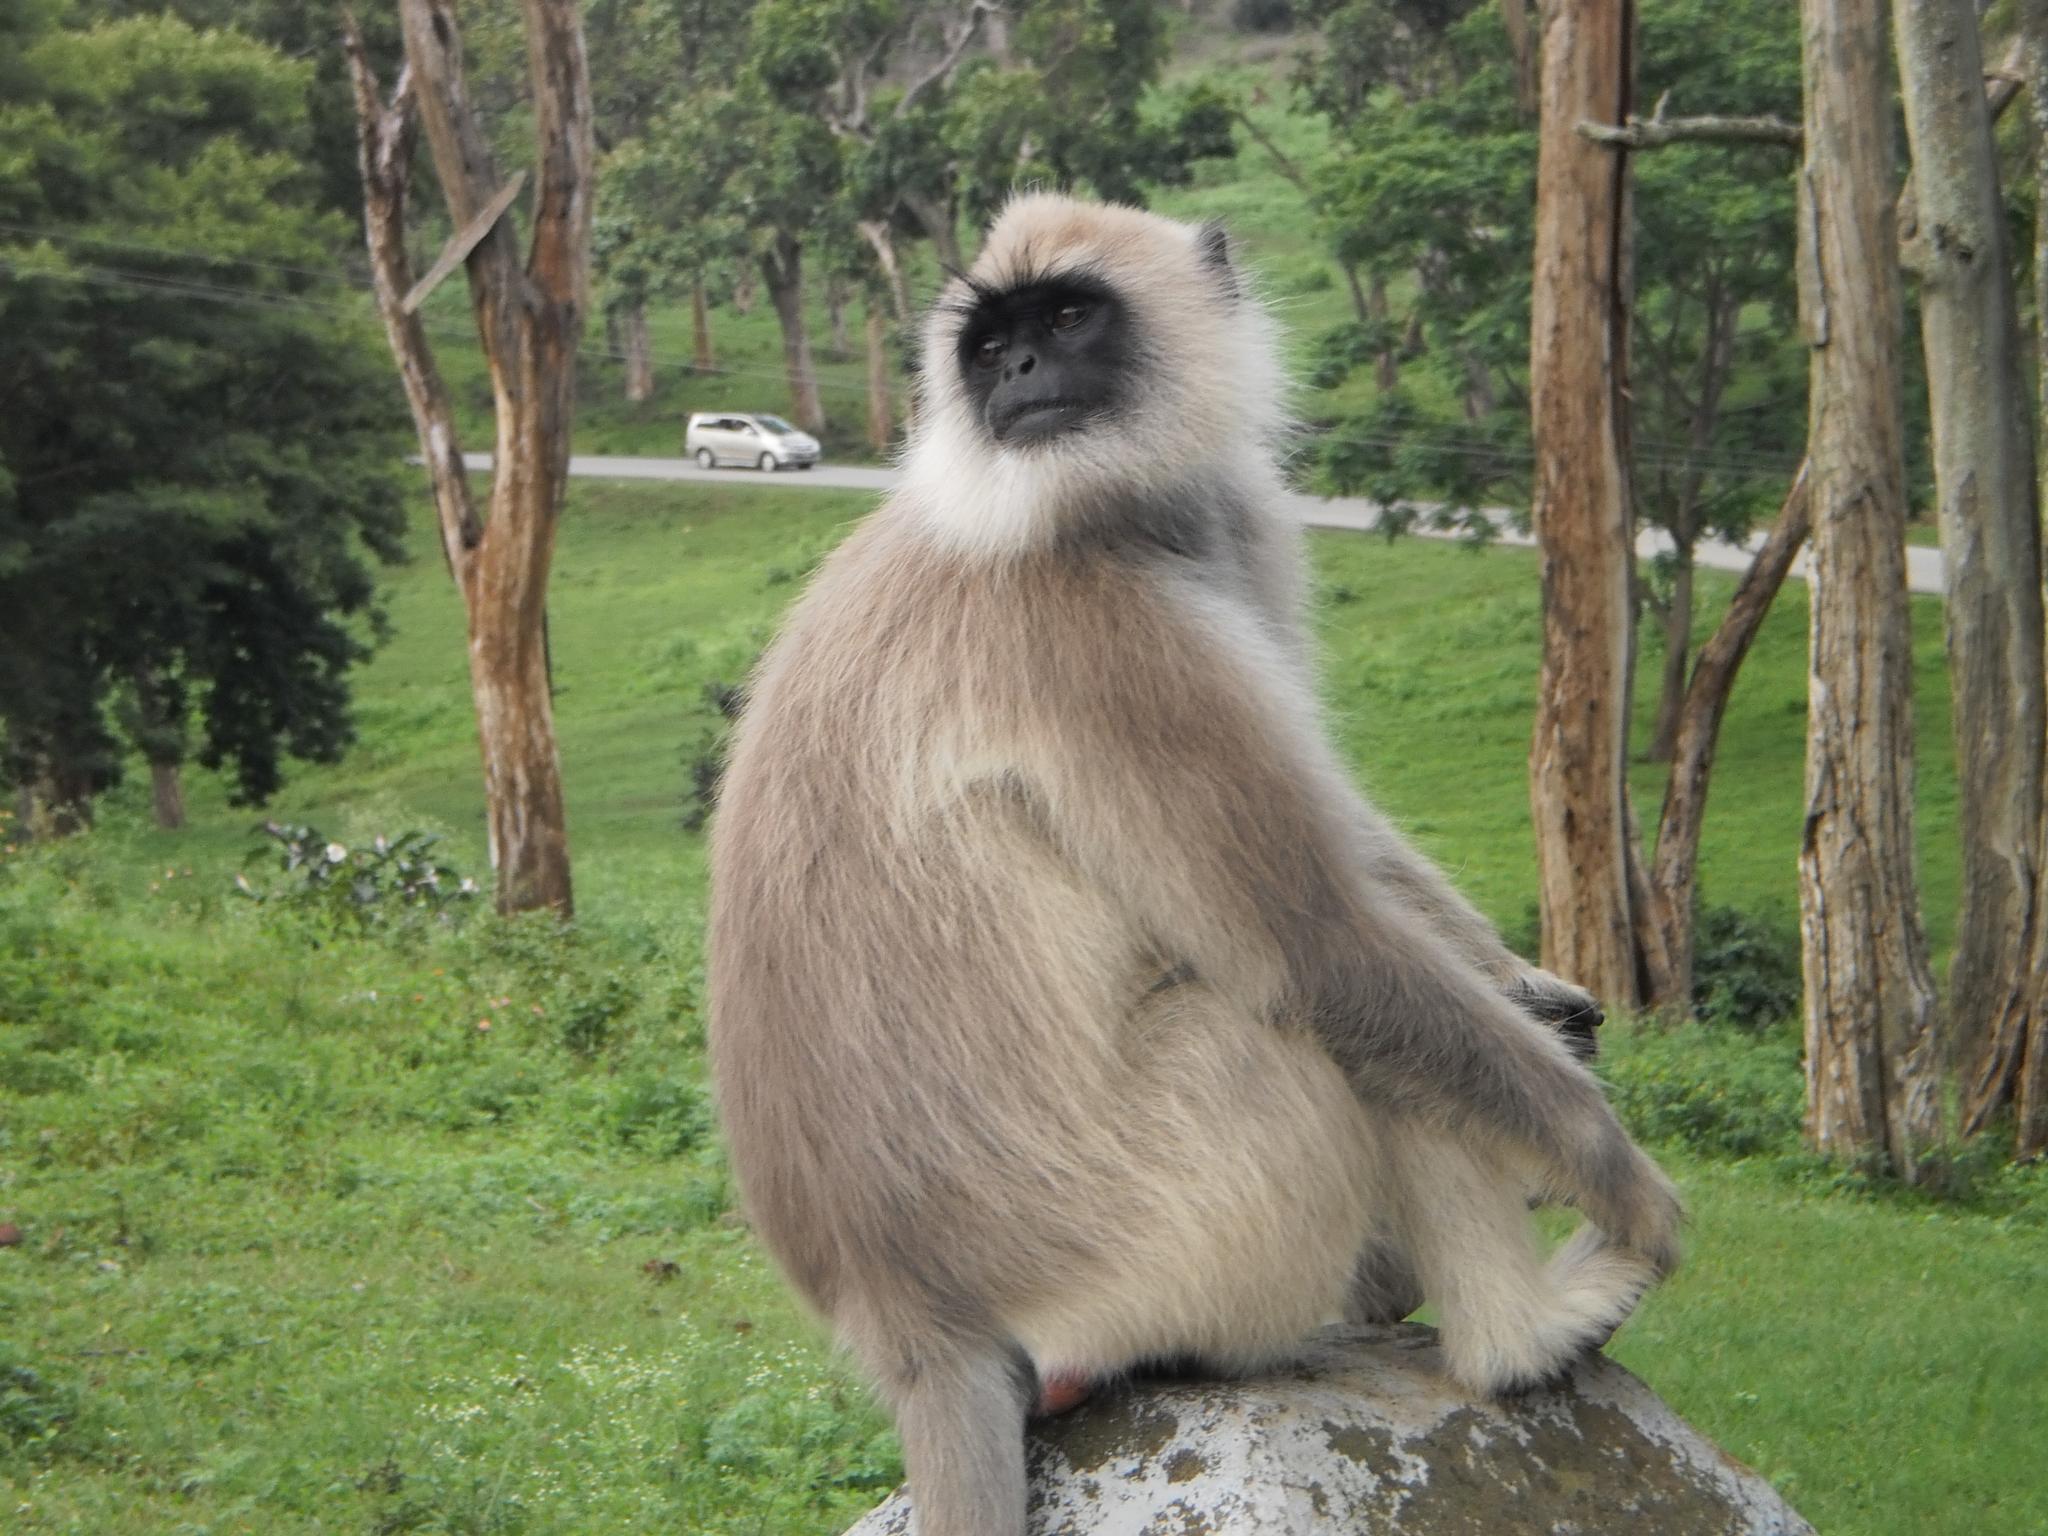 An alpha male langur by vanjimuthuj